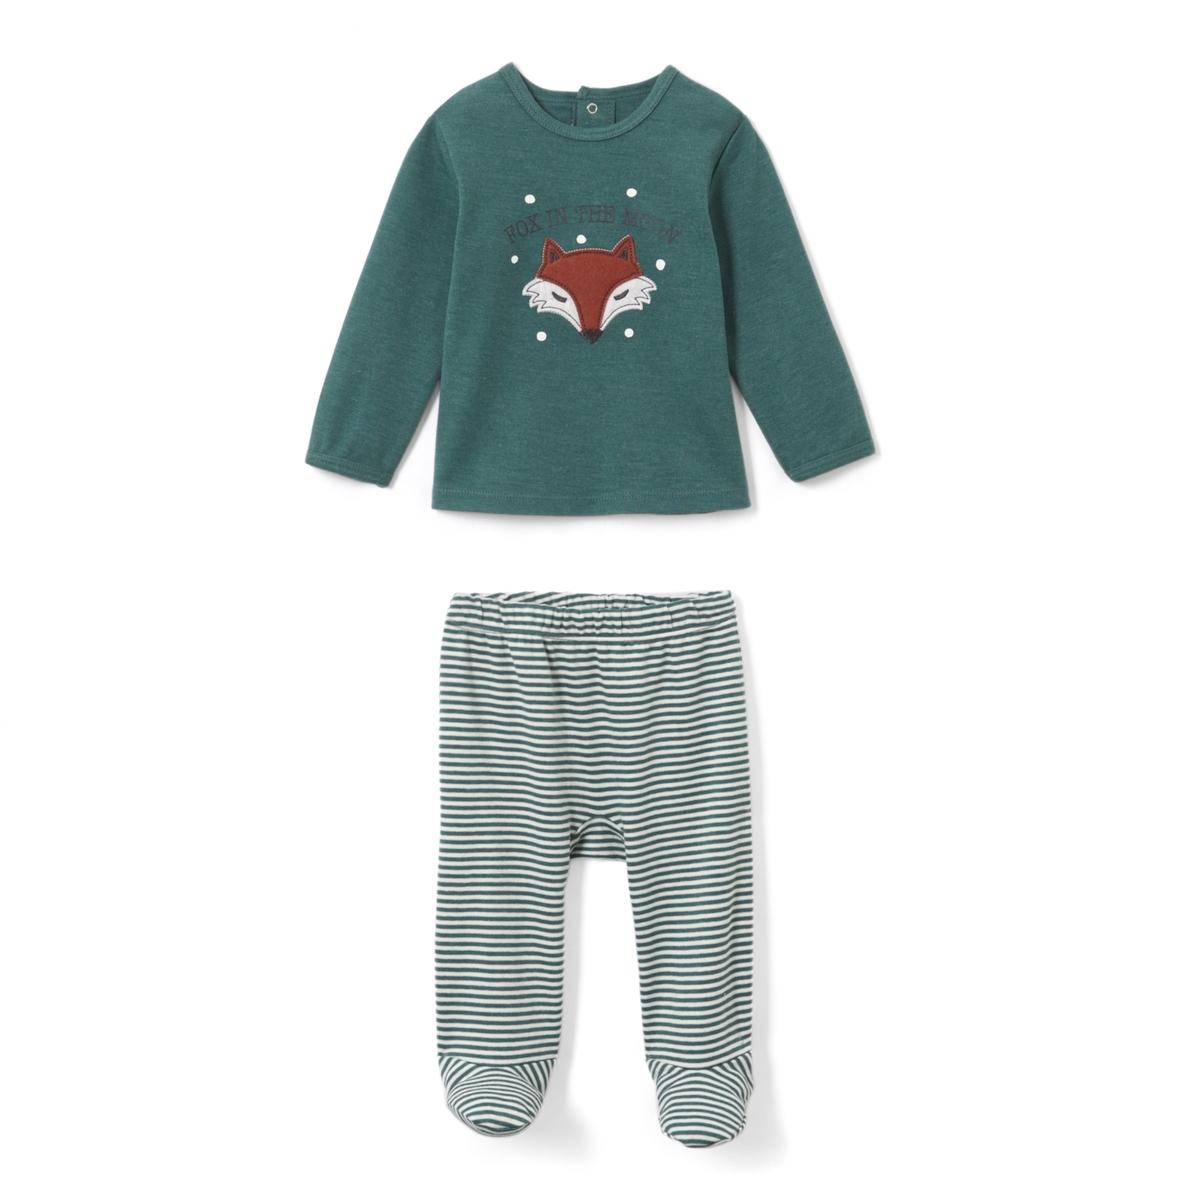 Пижама из 2 предметов с ножками, 0 - 3 лет Oeko Tex